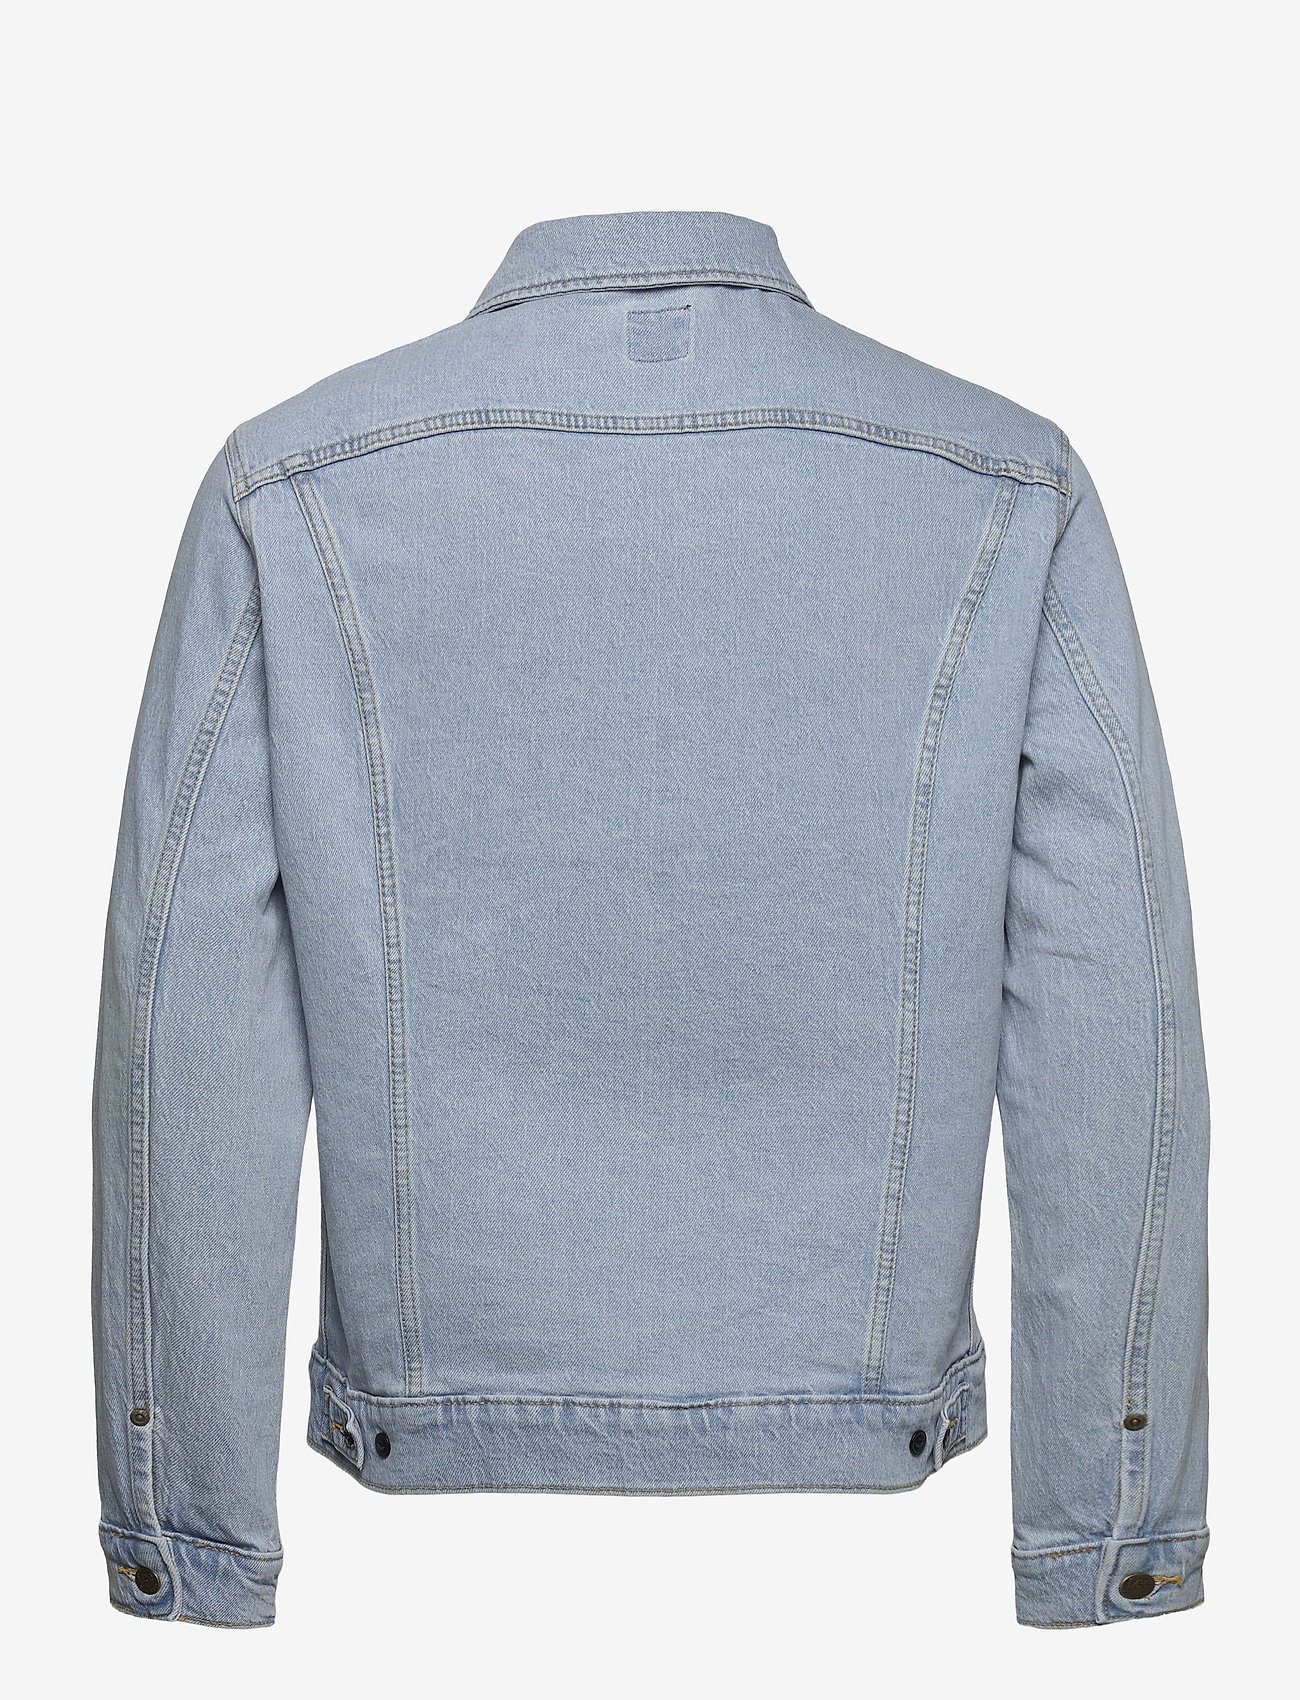 Lee Jeans - LEE RIDER JACKET - denim jackets - light alton - 1